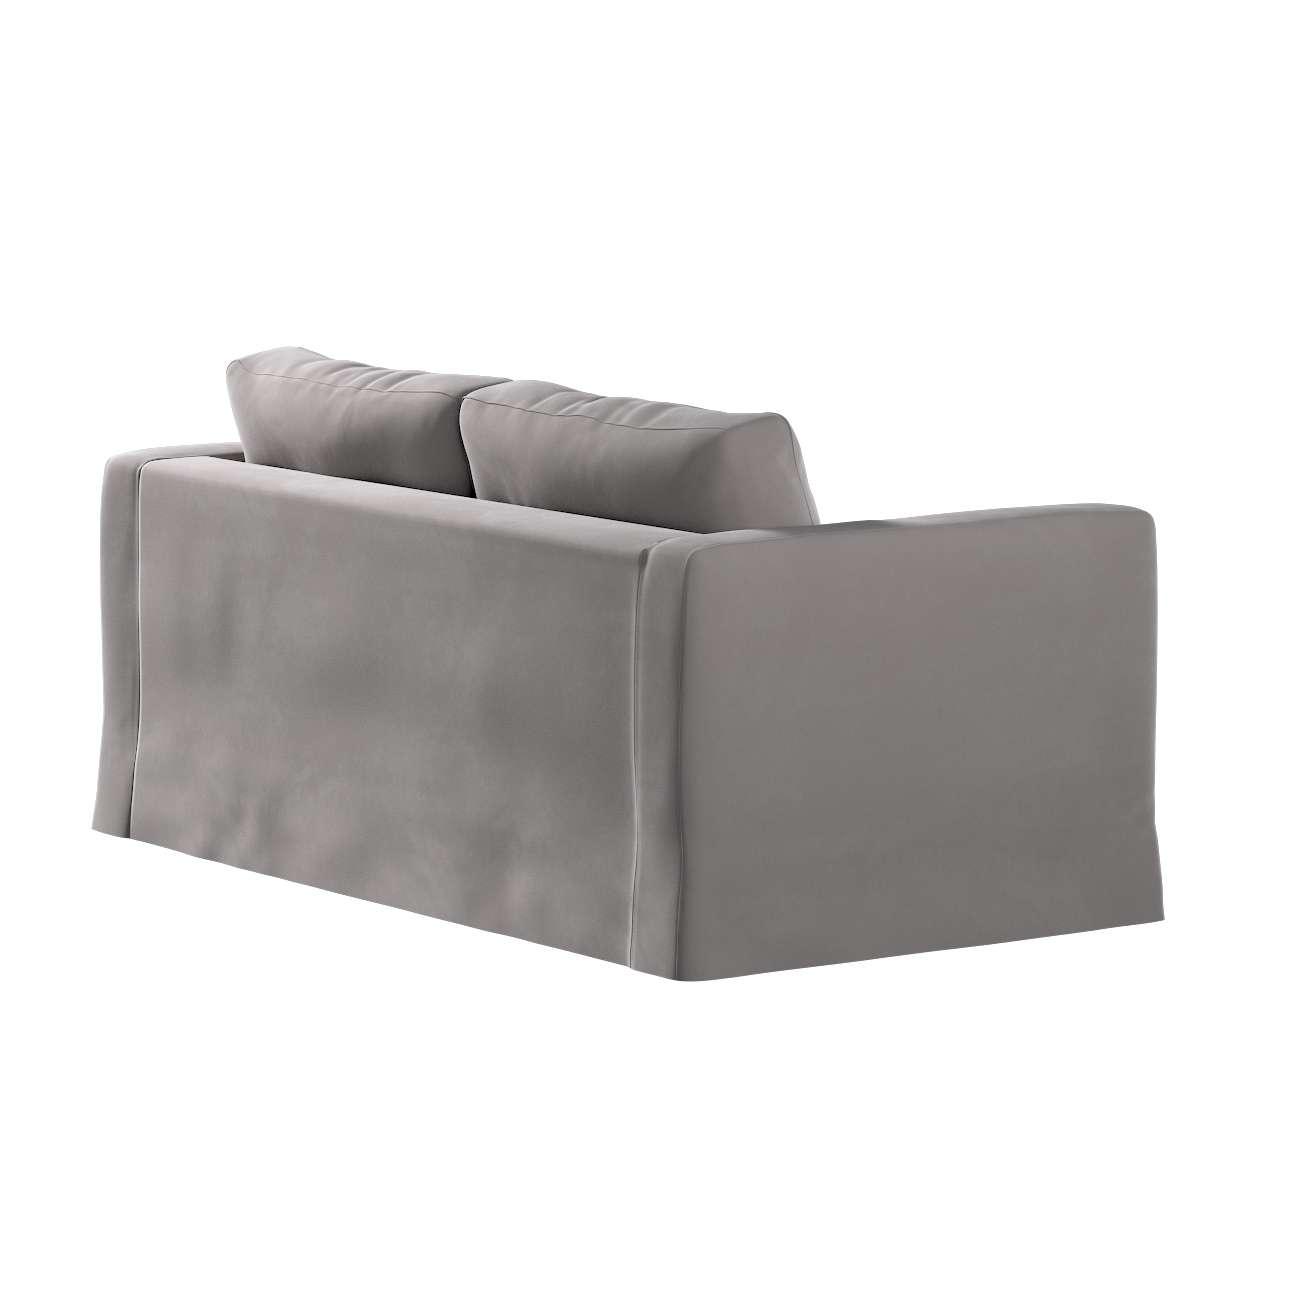 Floor length Karlstad 2-seater sofa cover in collection Velvet, fabric: 704-11